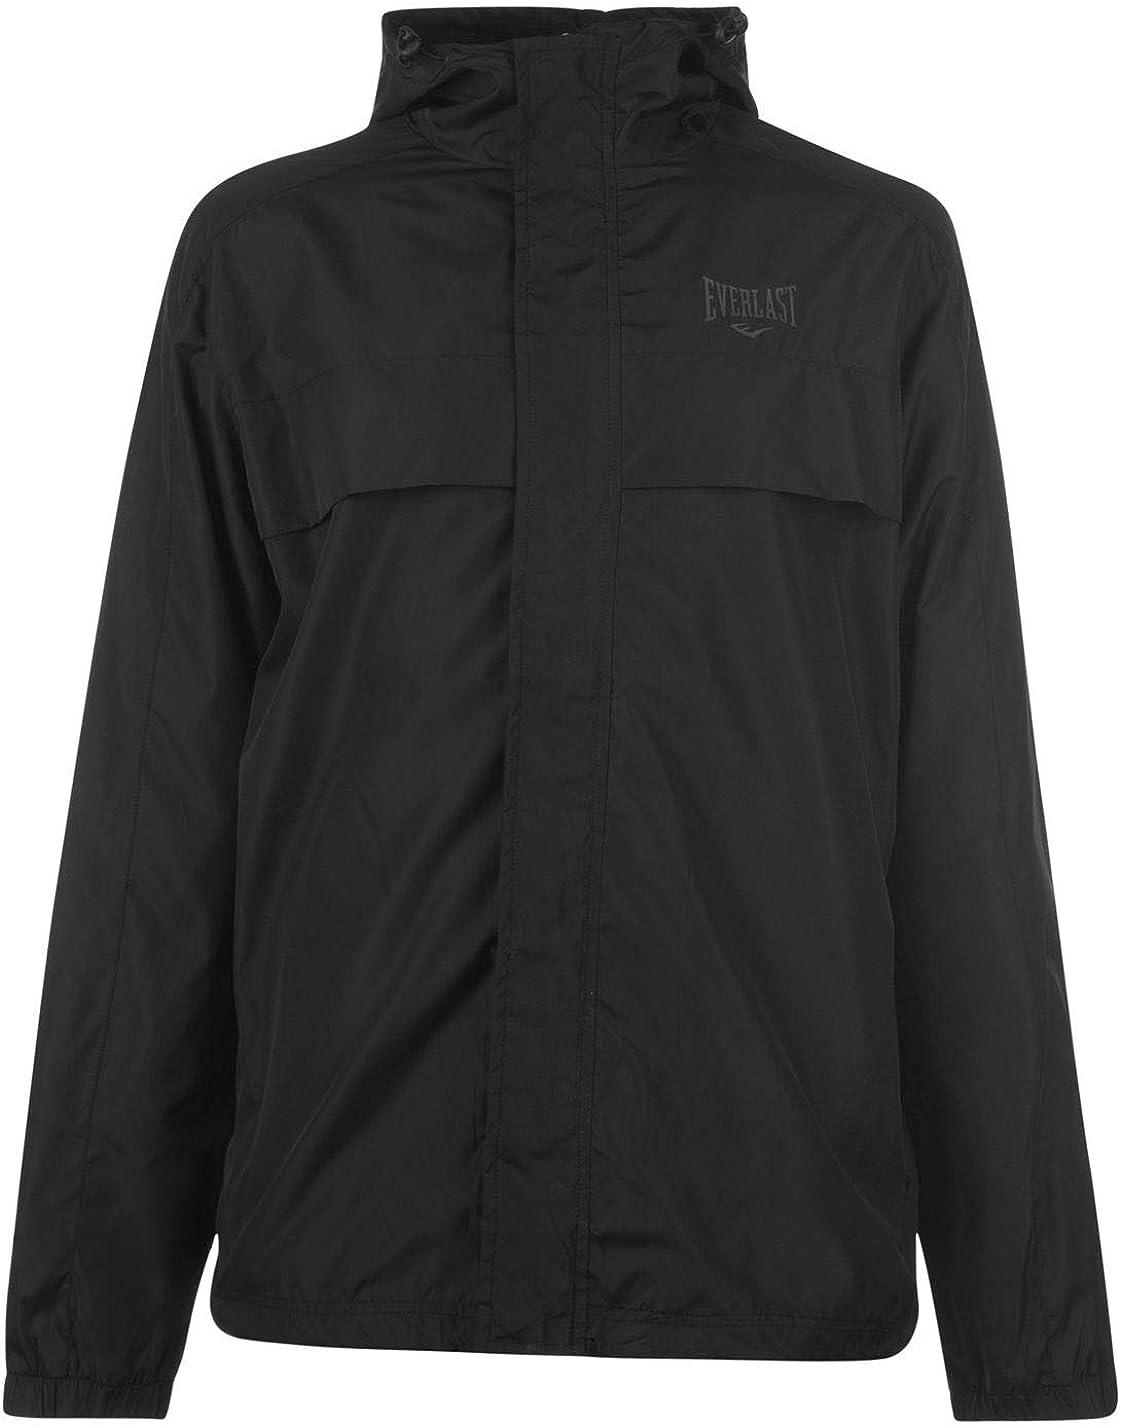 Lee Cooper Mens 初売り MA1 Bomber Jacket Zip Top 迅速な対応で商品をお届け致します Full Coat